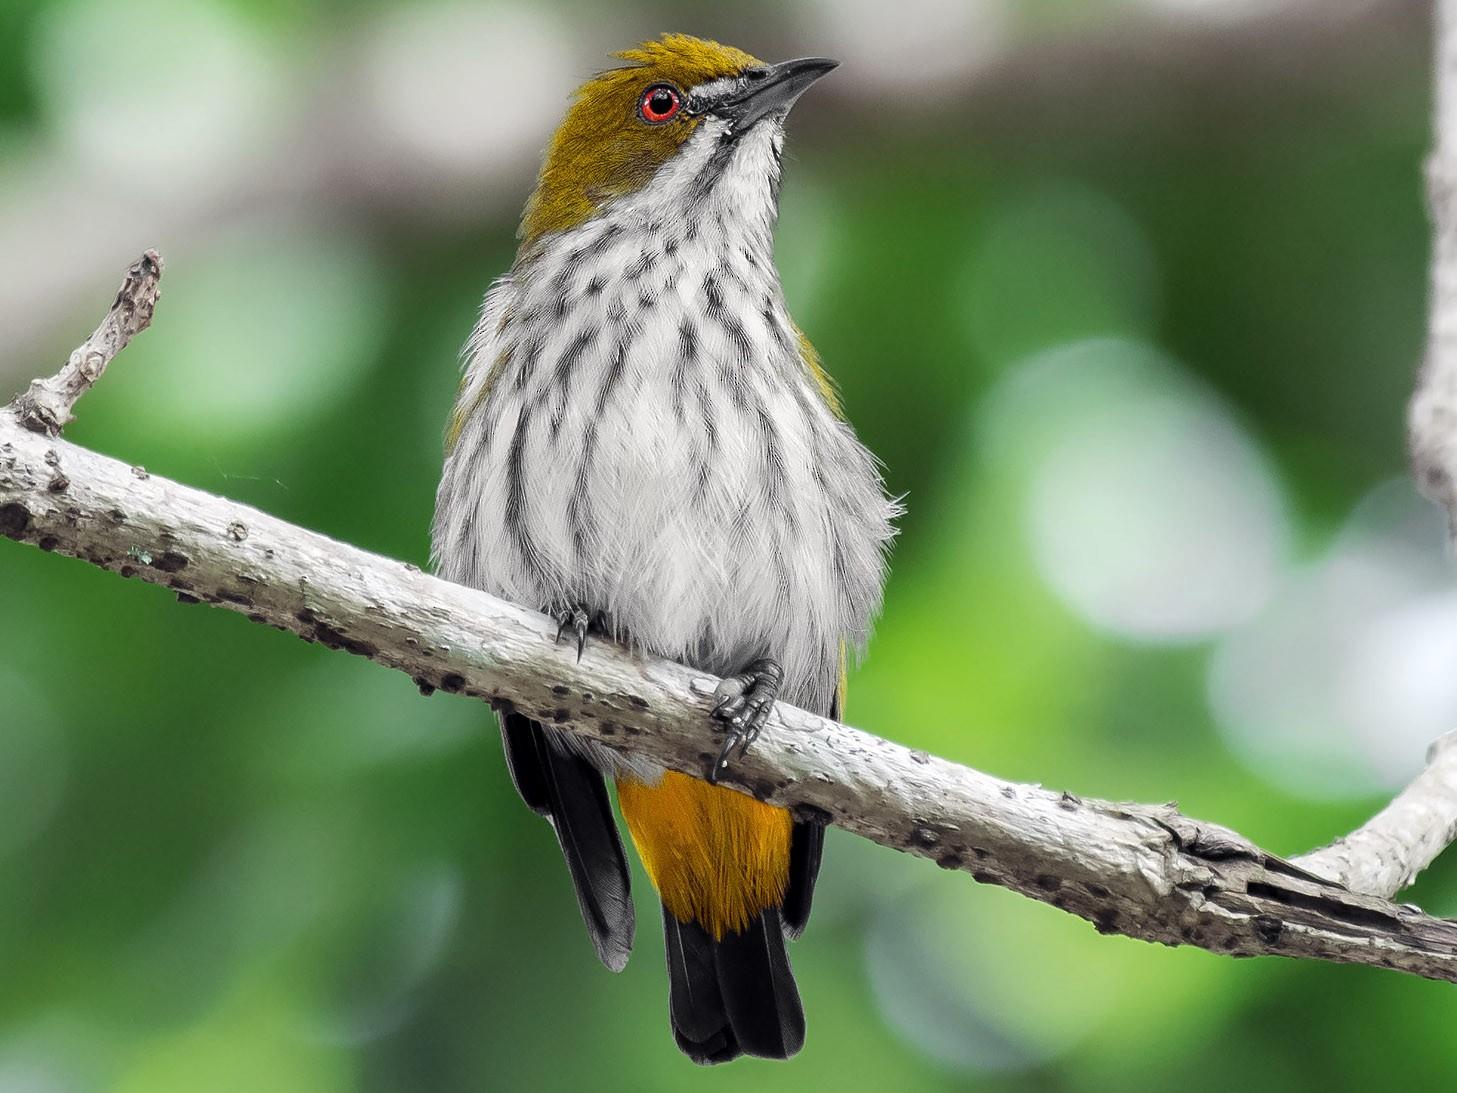 Yellow-vented Flowerpecker - Natthaphat Chotjuckdikul